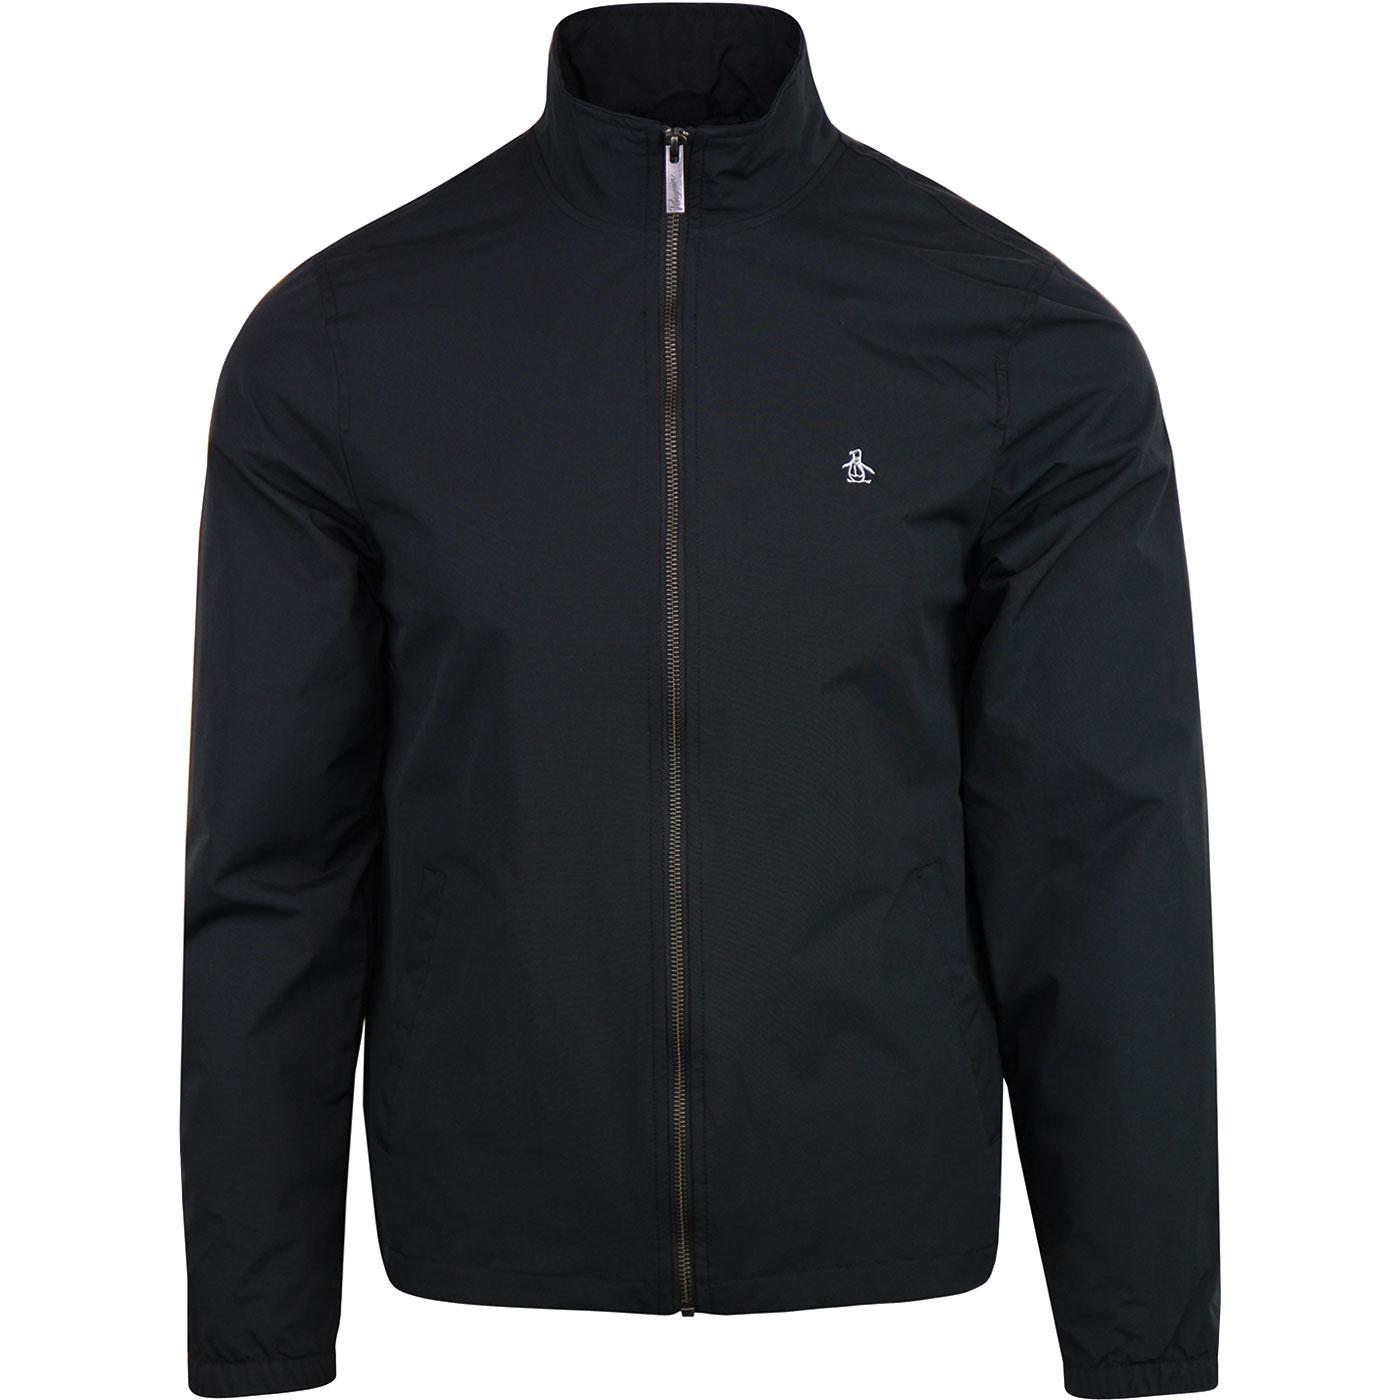 ORIGINAL PENGUIN Men's Retro Windcheater Jacket